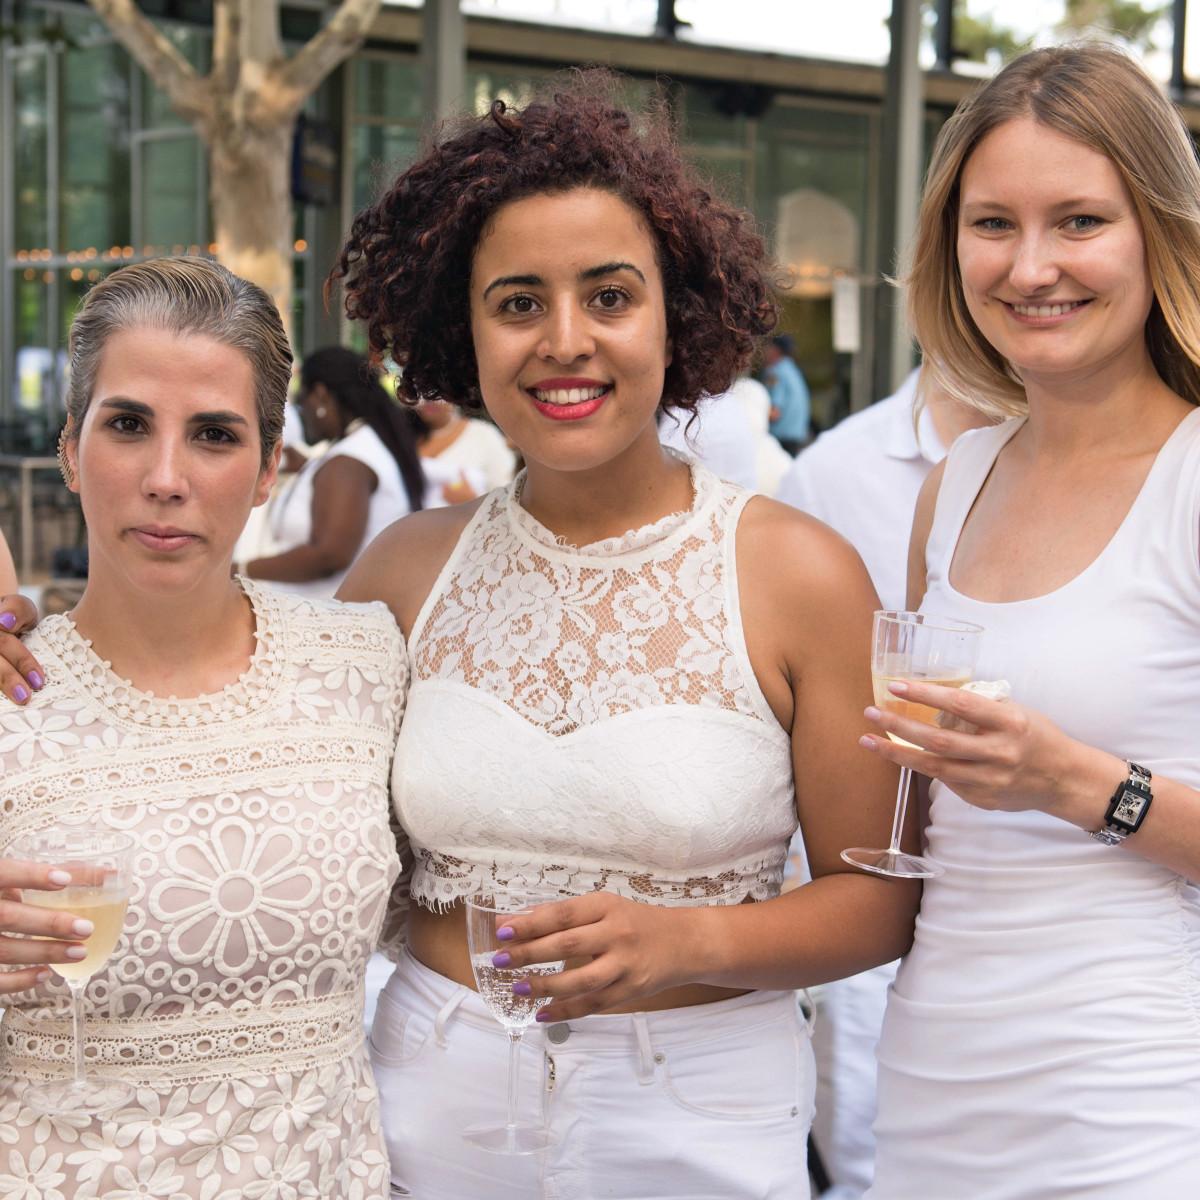 Houston, Diner en Blanc, June 2015, Eleanor Cluzel, Salma Rizki, Yulia Baker